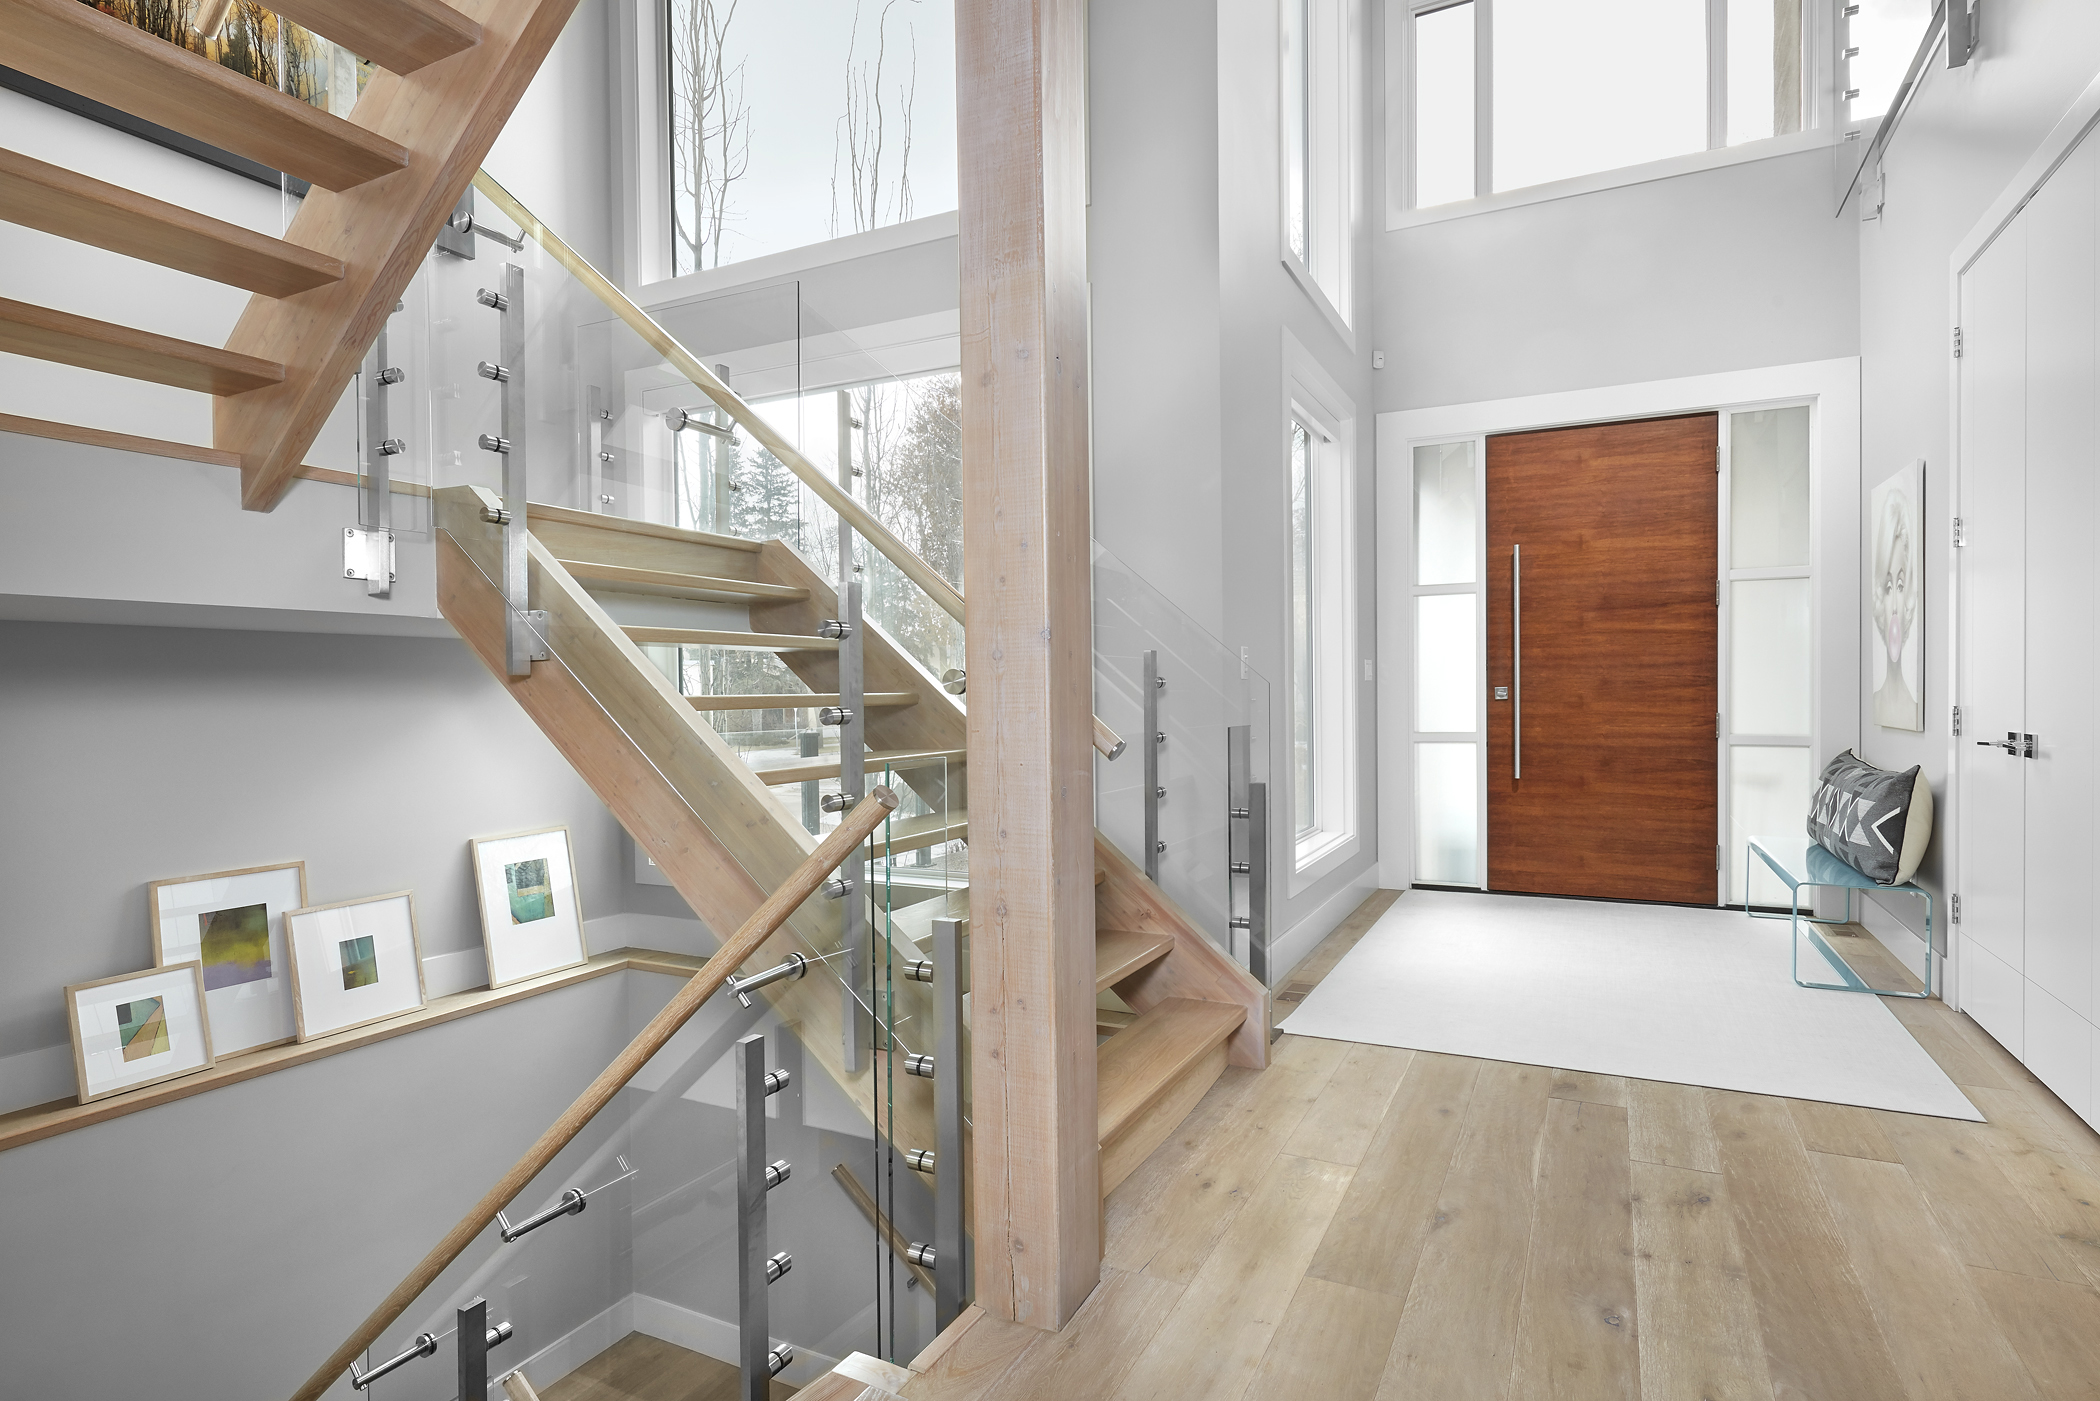 Built by Birkholz -